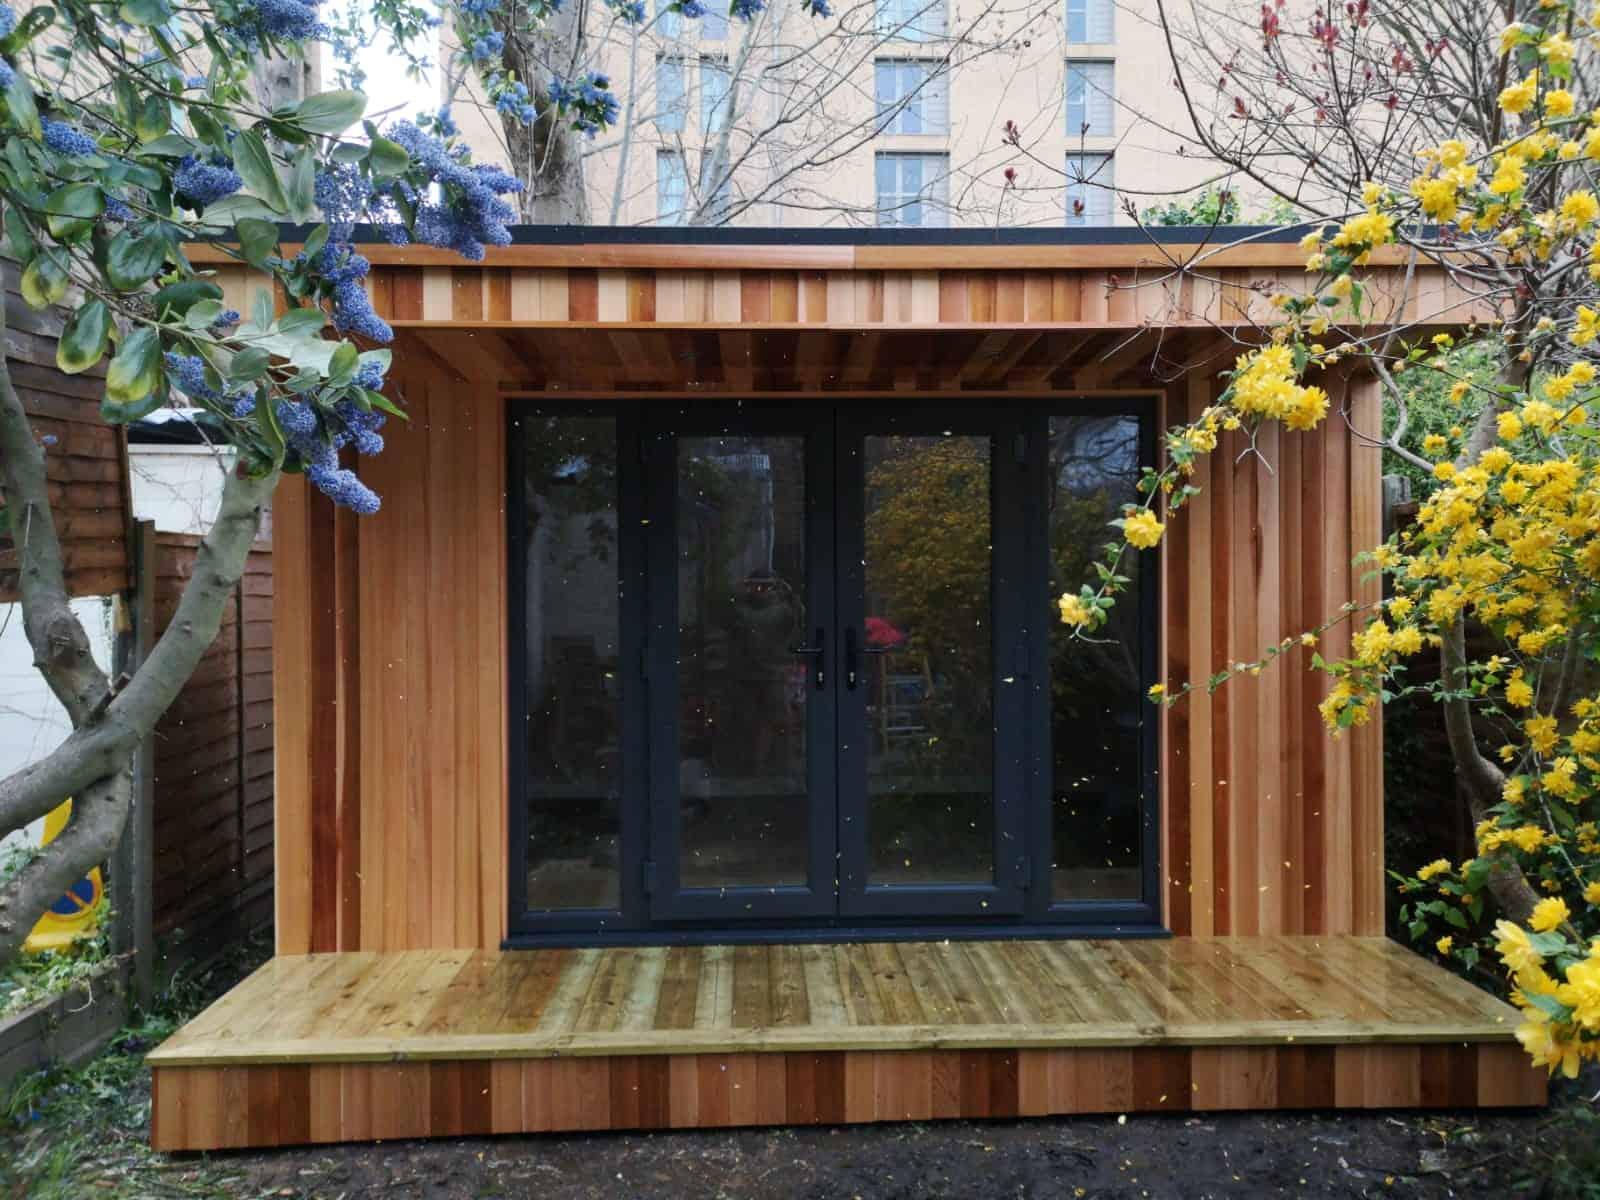 garden rooms have increased in popularity